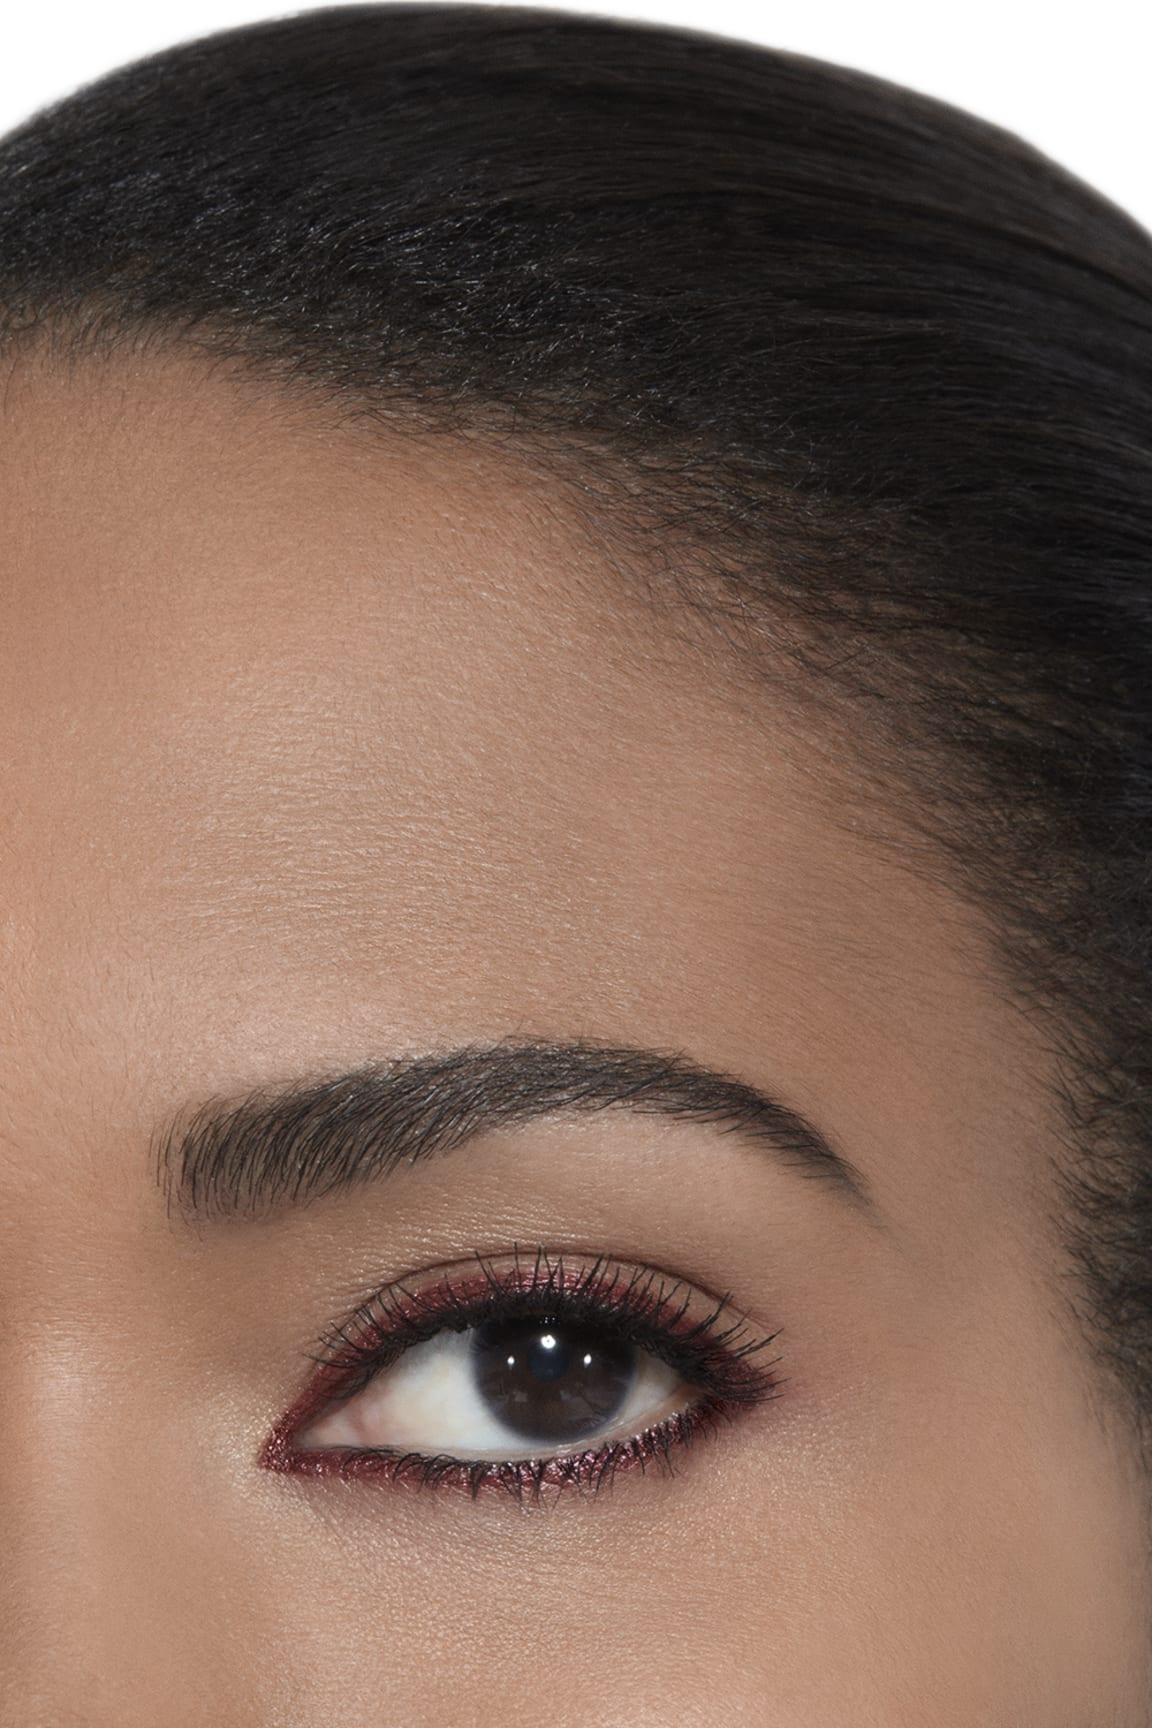 Application makeup visual 2 - STYLO YEUX WATERPROOF 928 - EROS